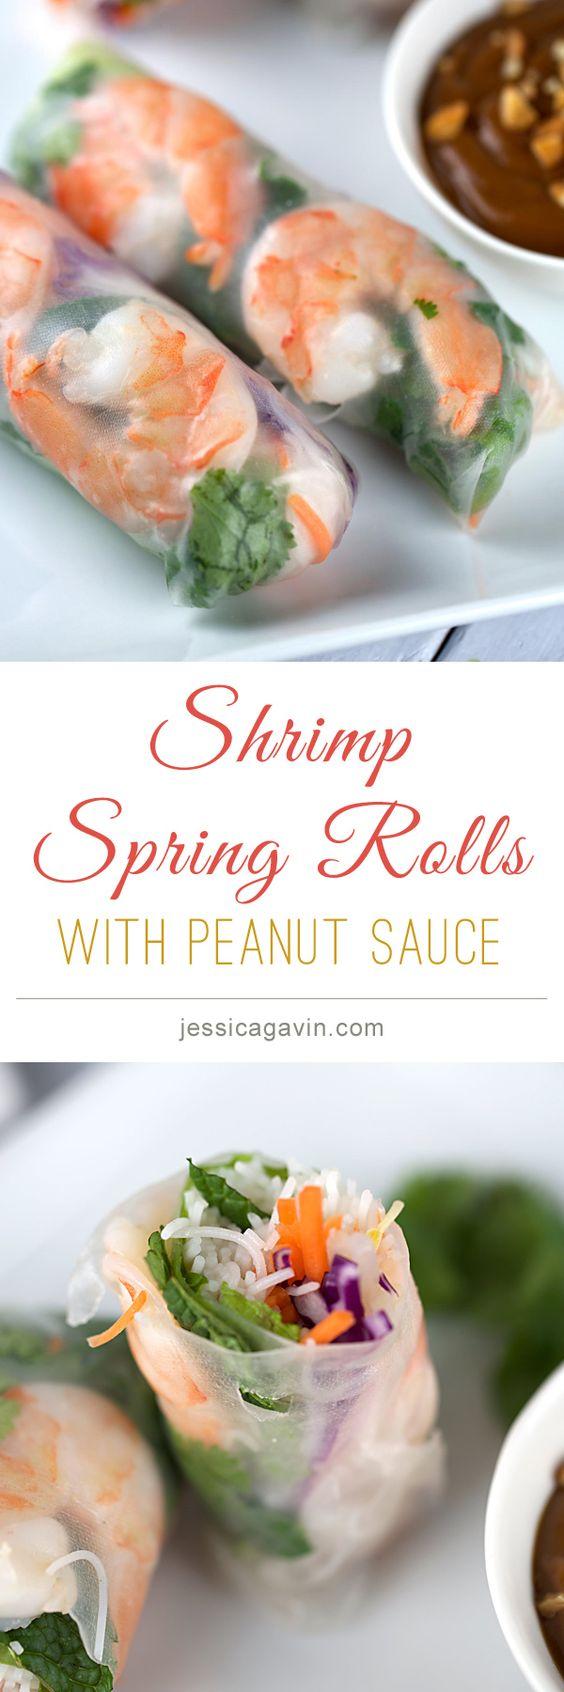 ... spring rolls peanut dipping sauces shrimp spring rolls shrimp dipping